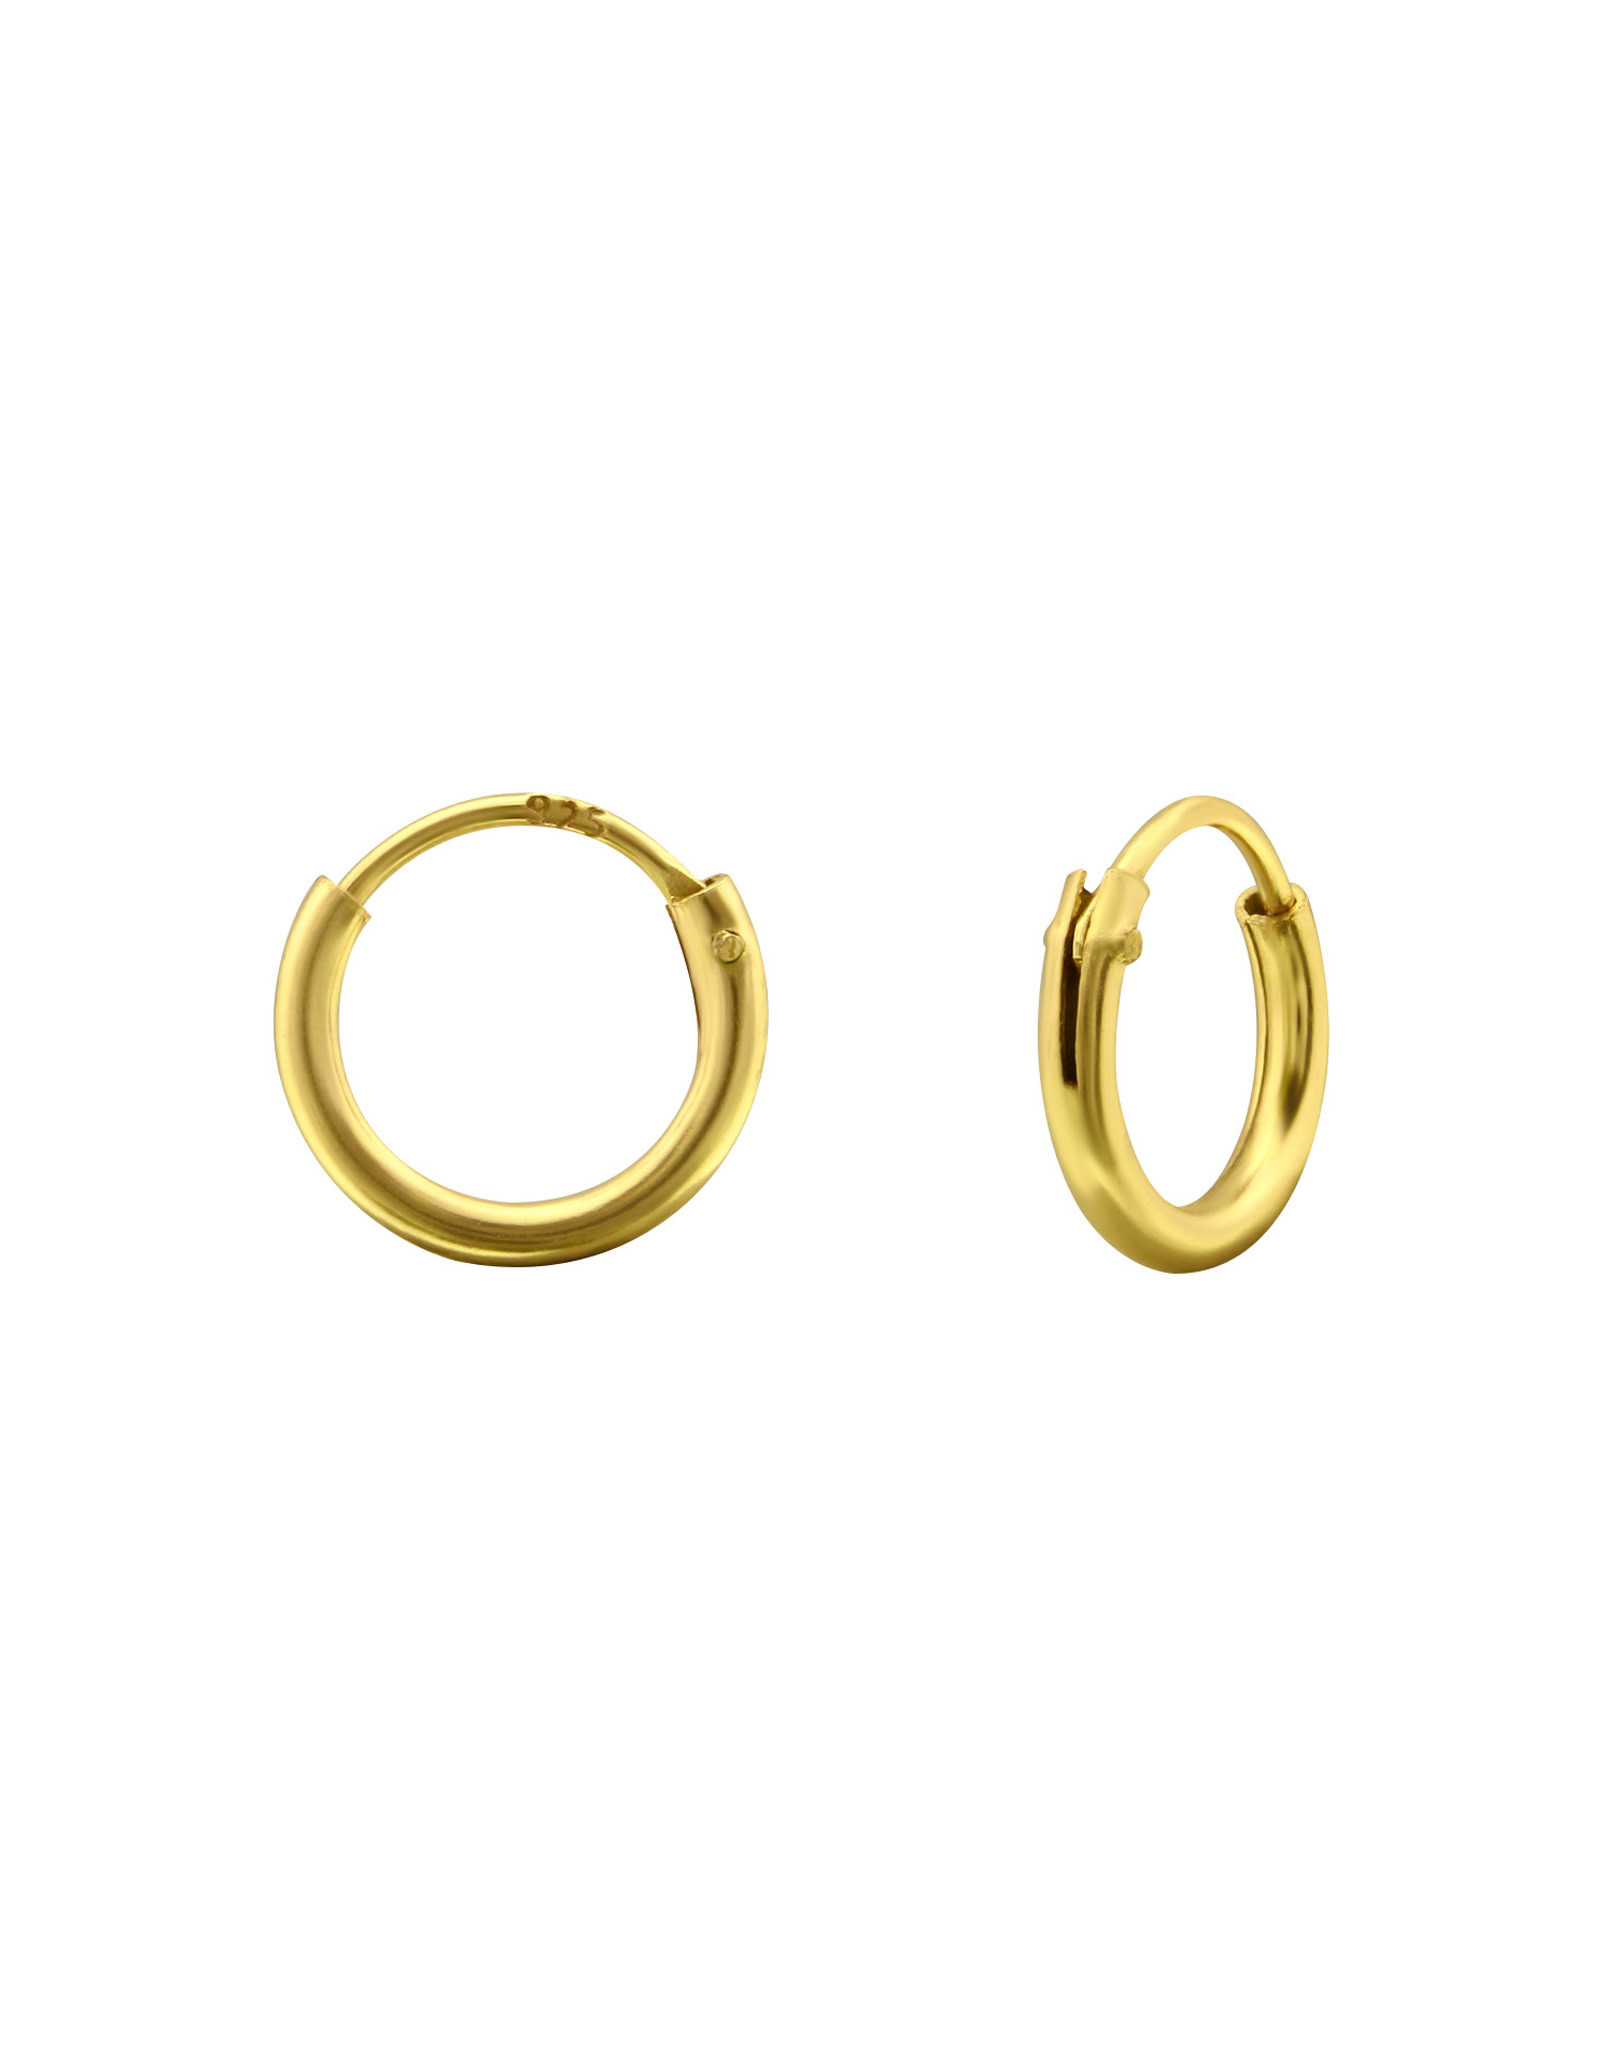 Ringetjes verguld 10mm